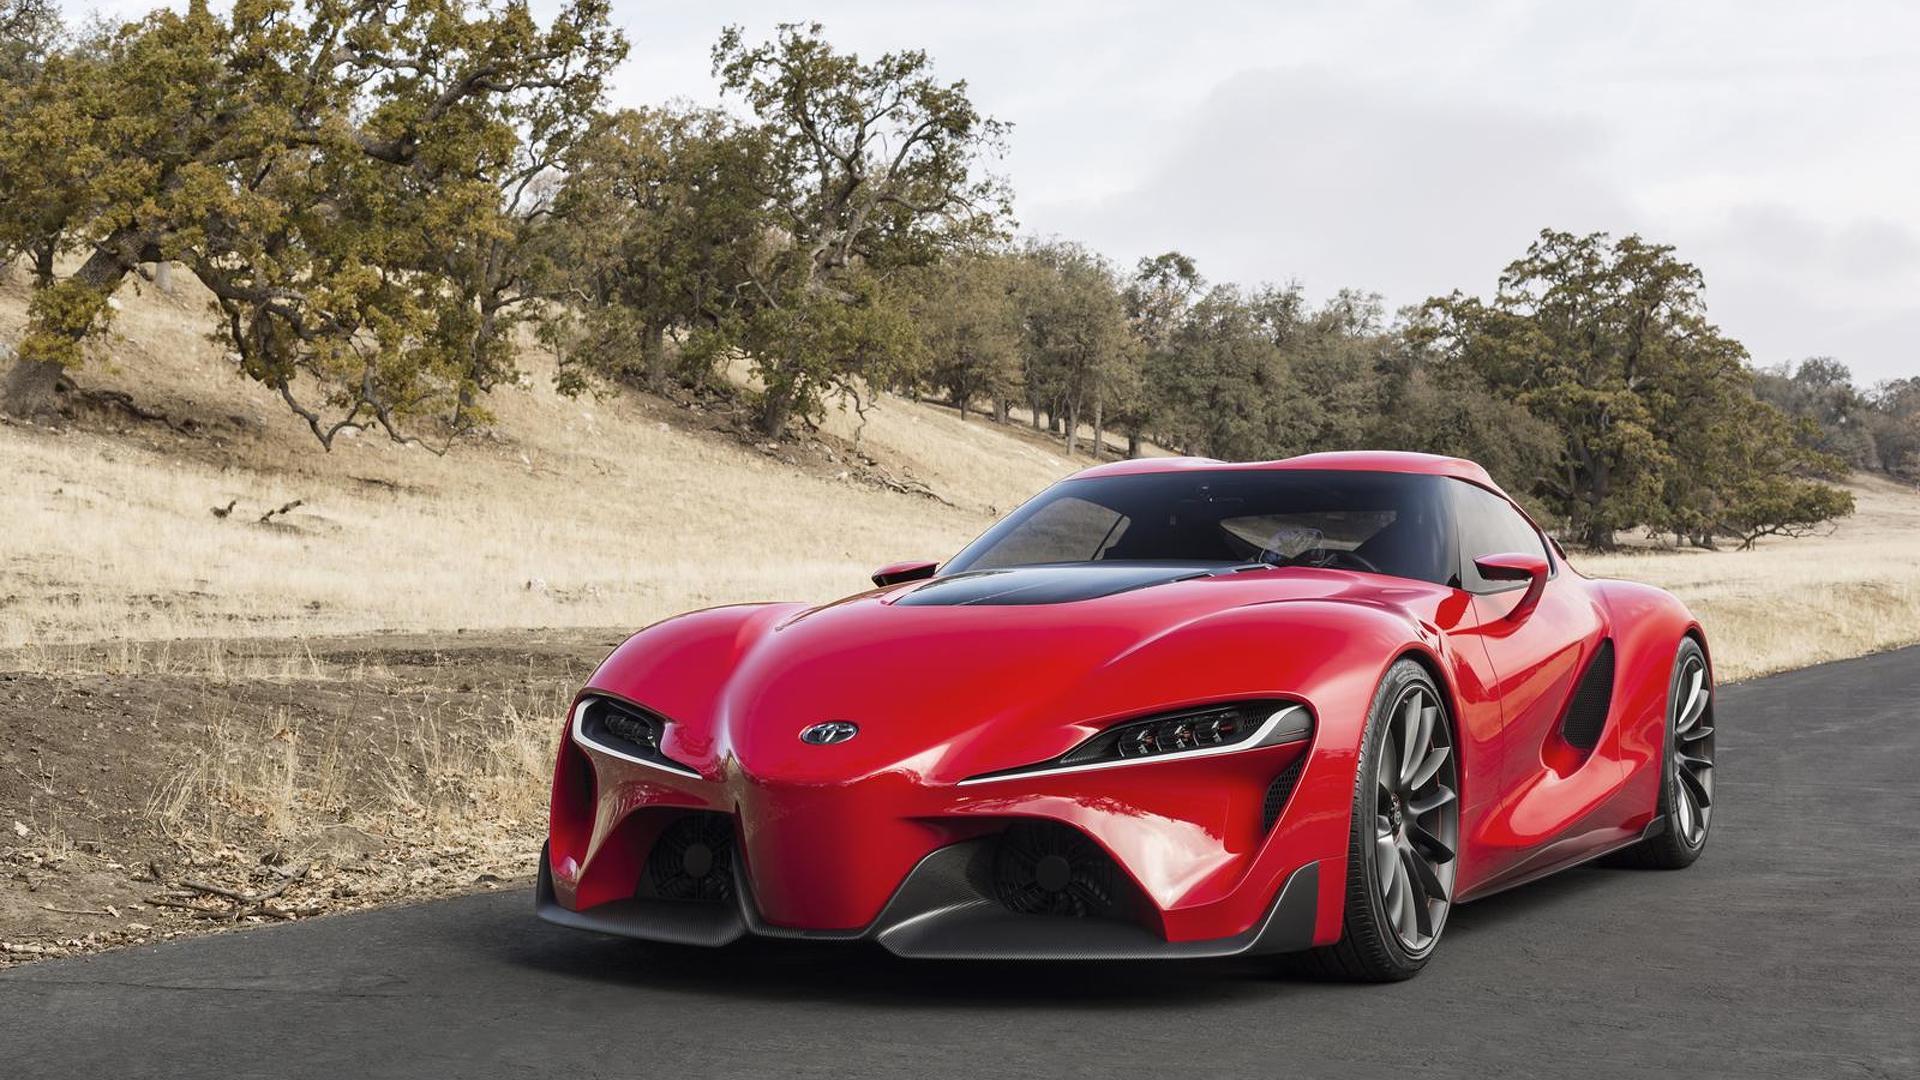 Toyota Supra on schedule for 2018 return